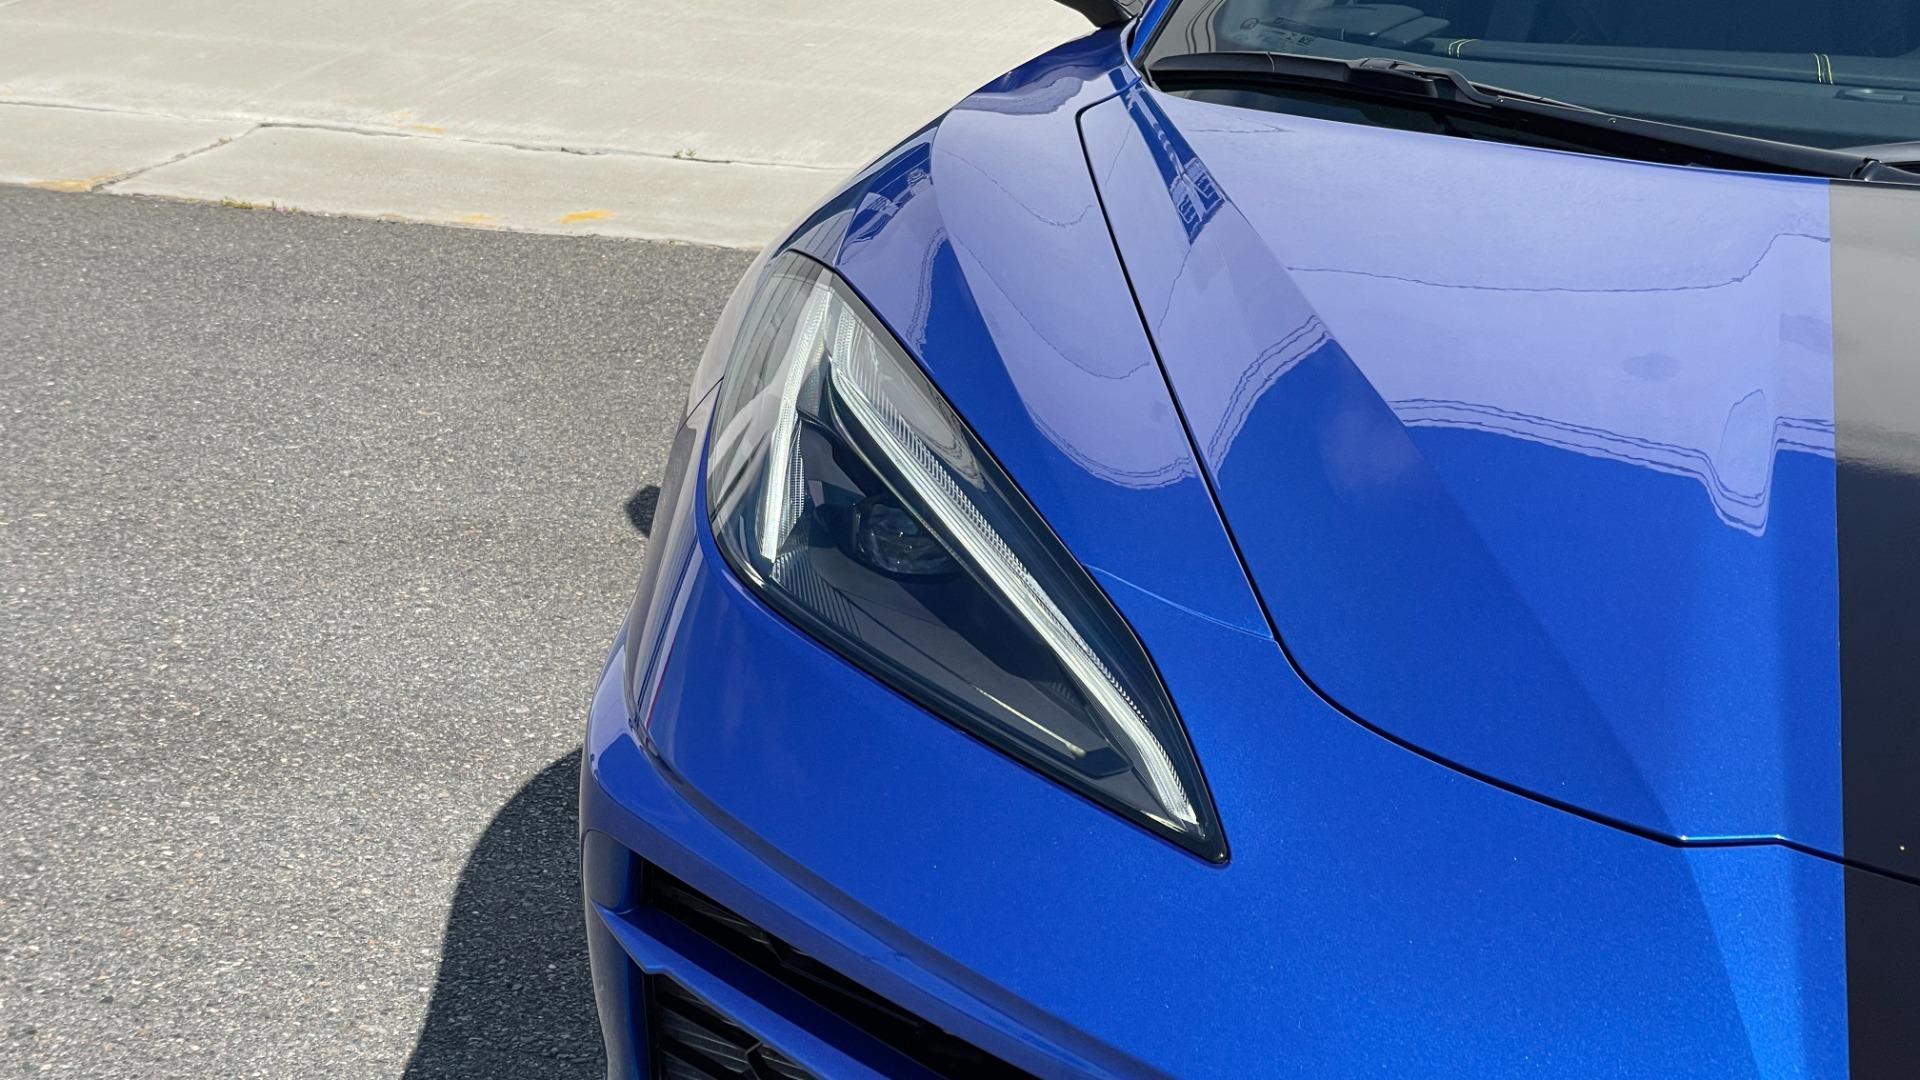 Used 2021 Chevrolet CORVETTE STINGRAY 3LT COUPE / 8-SPD / PERF PKG / NAV / BOSE / REARVIEW for sale $110,995 at Formula Imports in Charlotte NC 28227 19